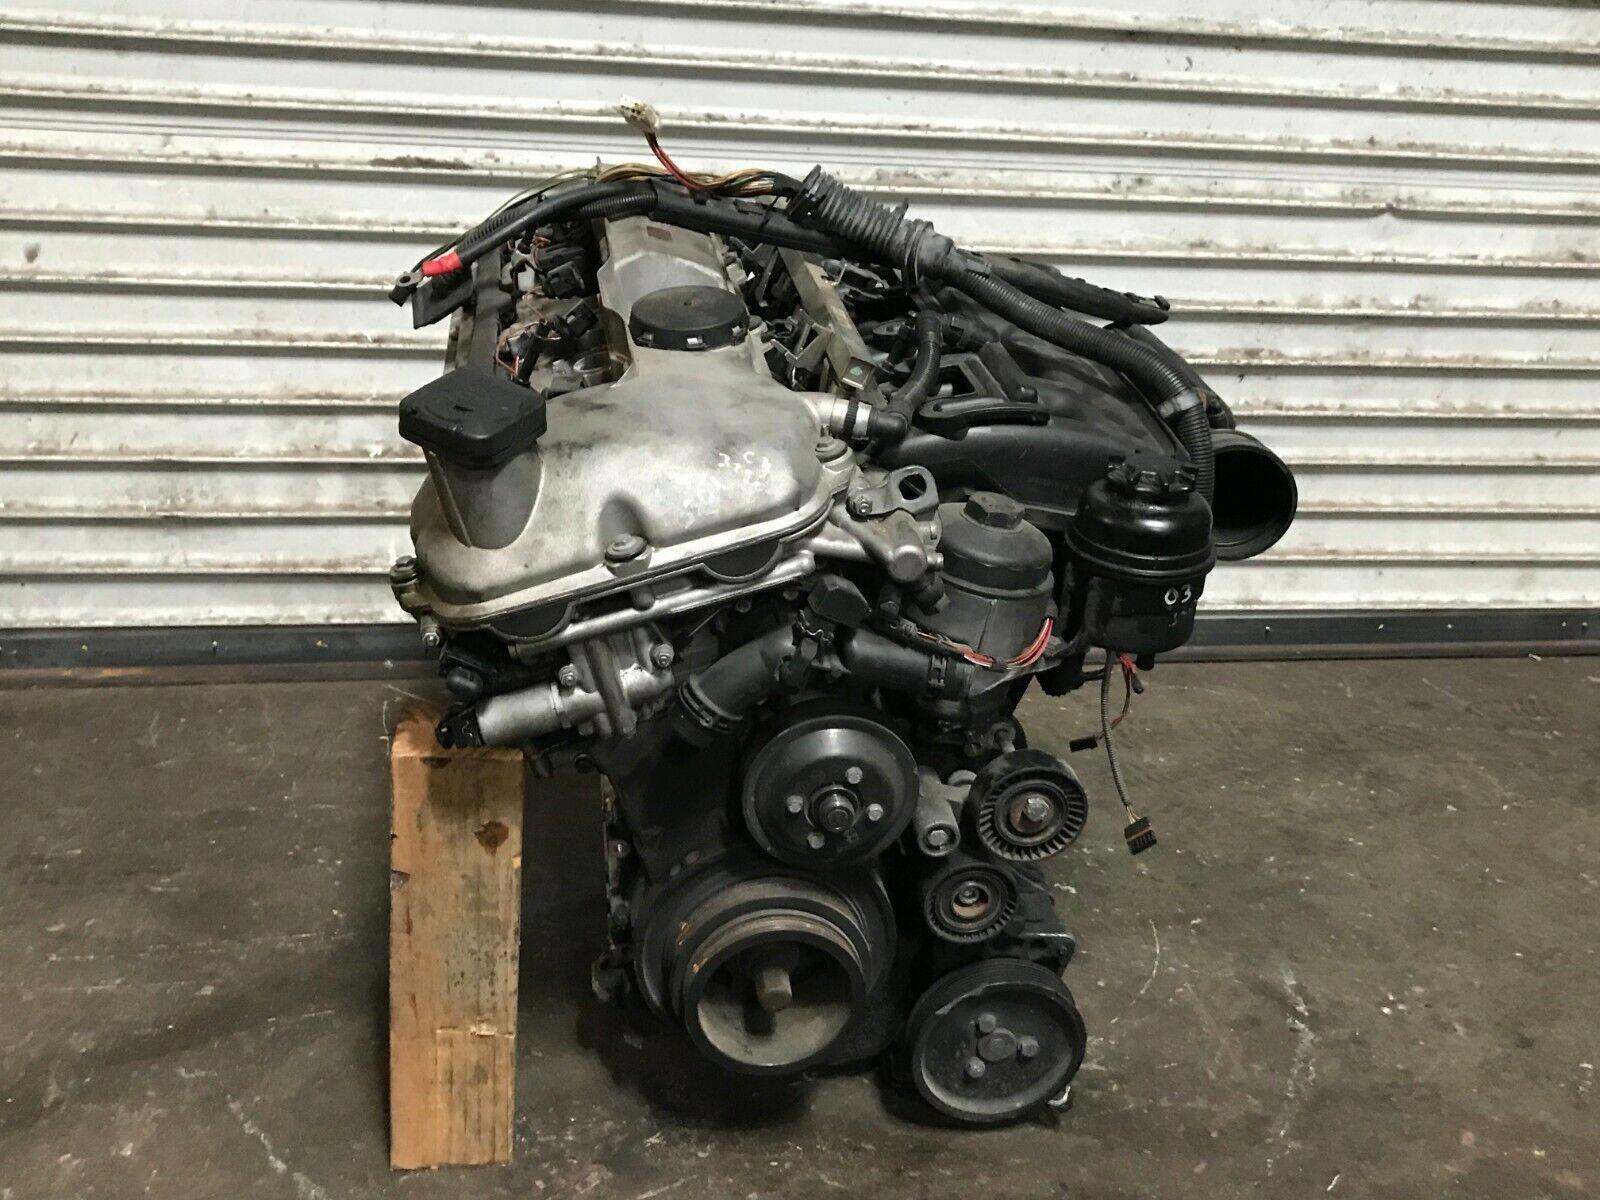 Bmw E46 Series 3 M54 330i Petrol Engine Block For Sale Online Ebay